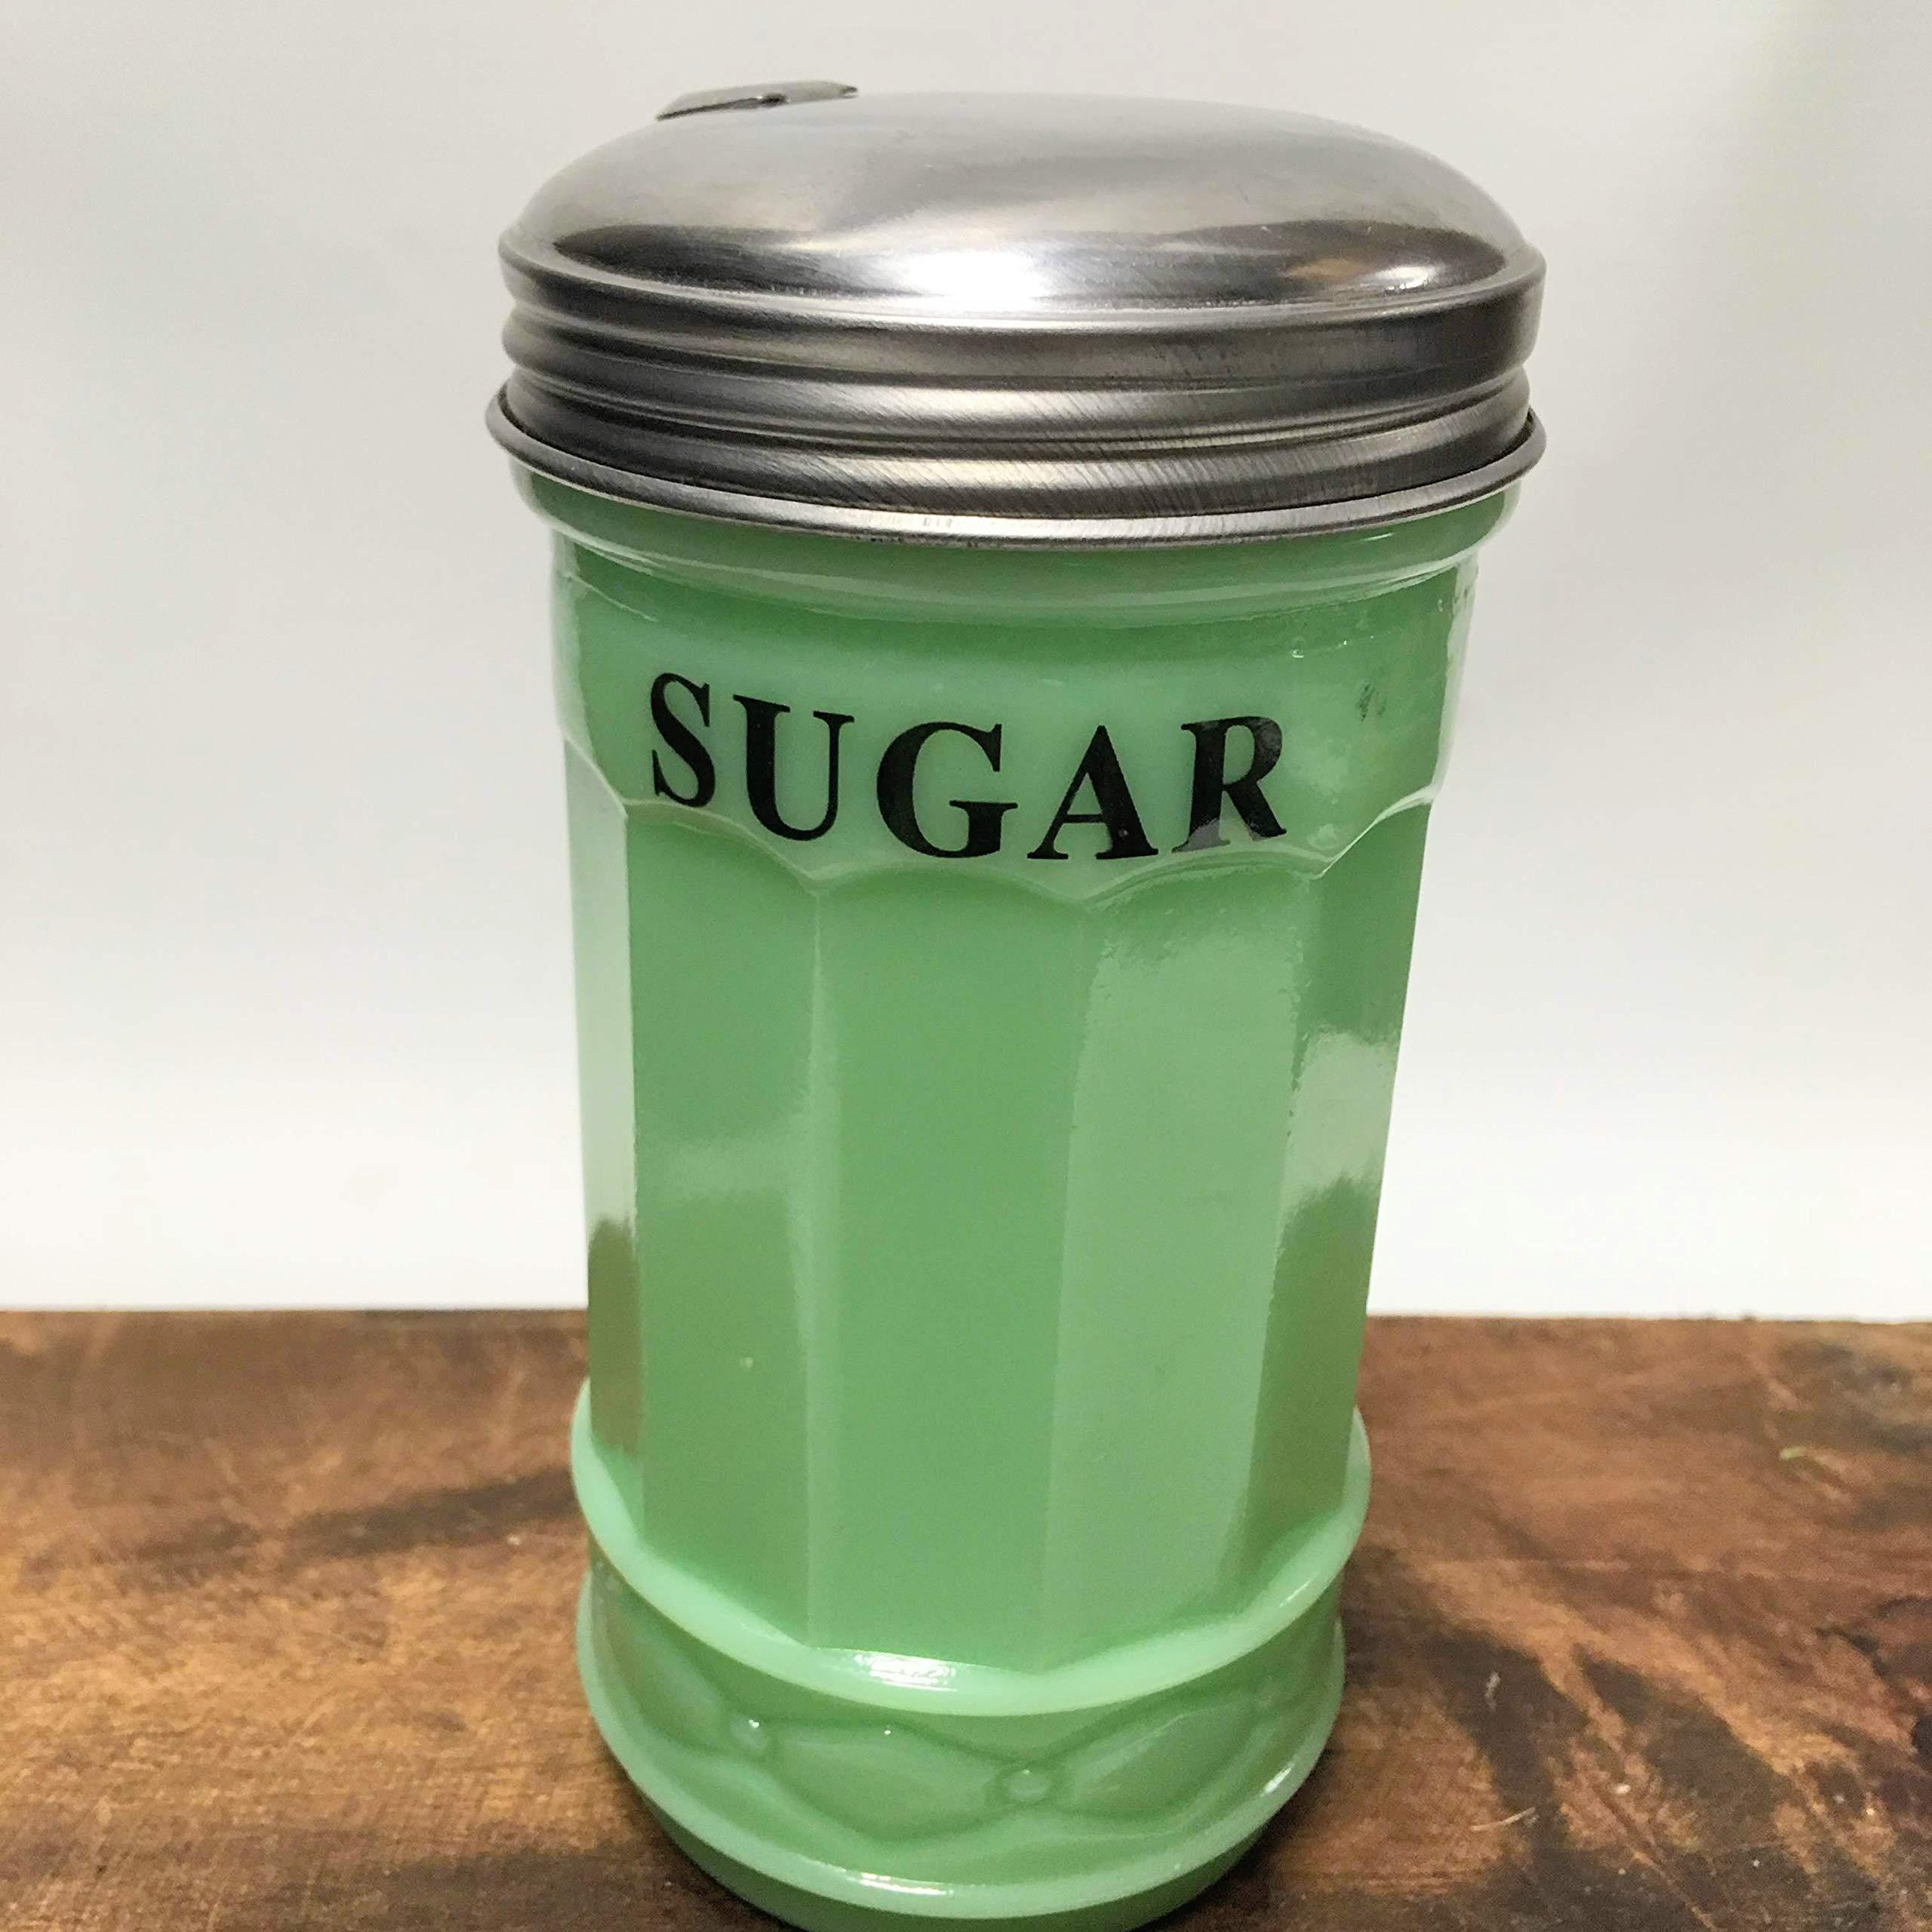 Jadeite Glass SUGAR Pourer with Spout - Retro Vintage Style Kitchen by Generic